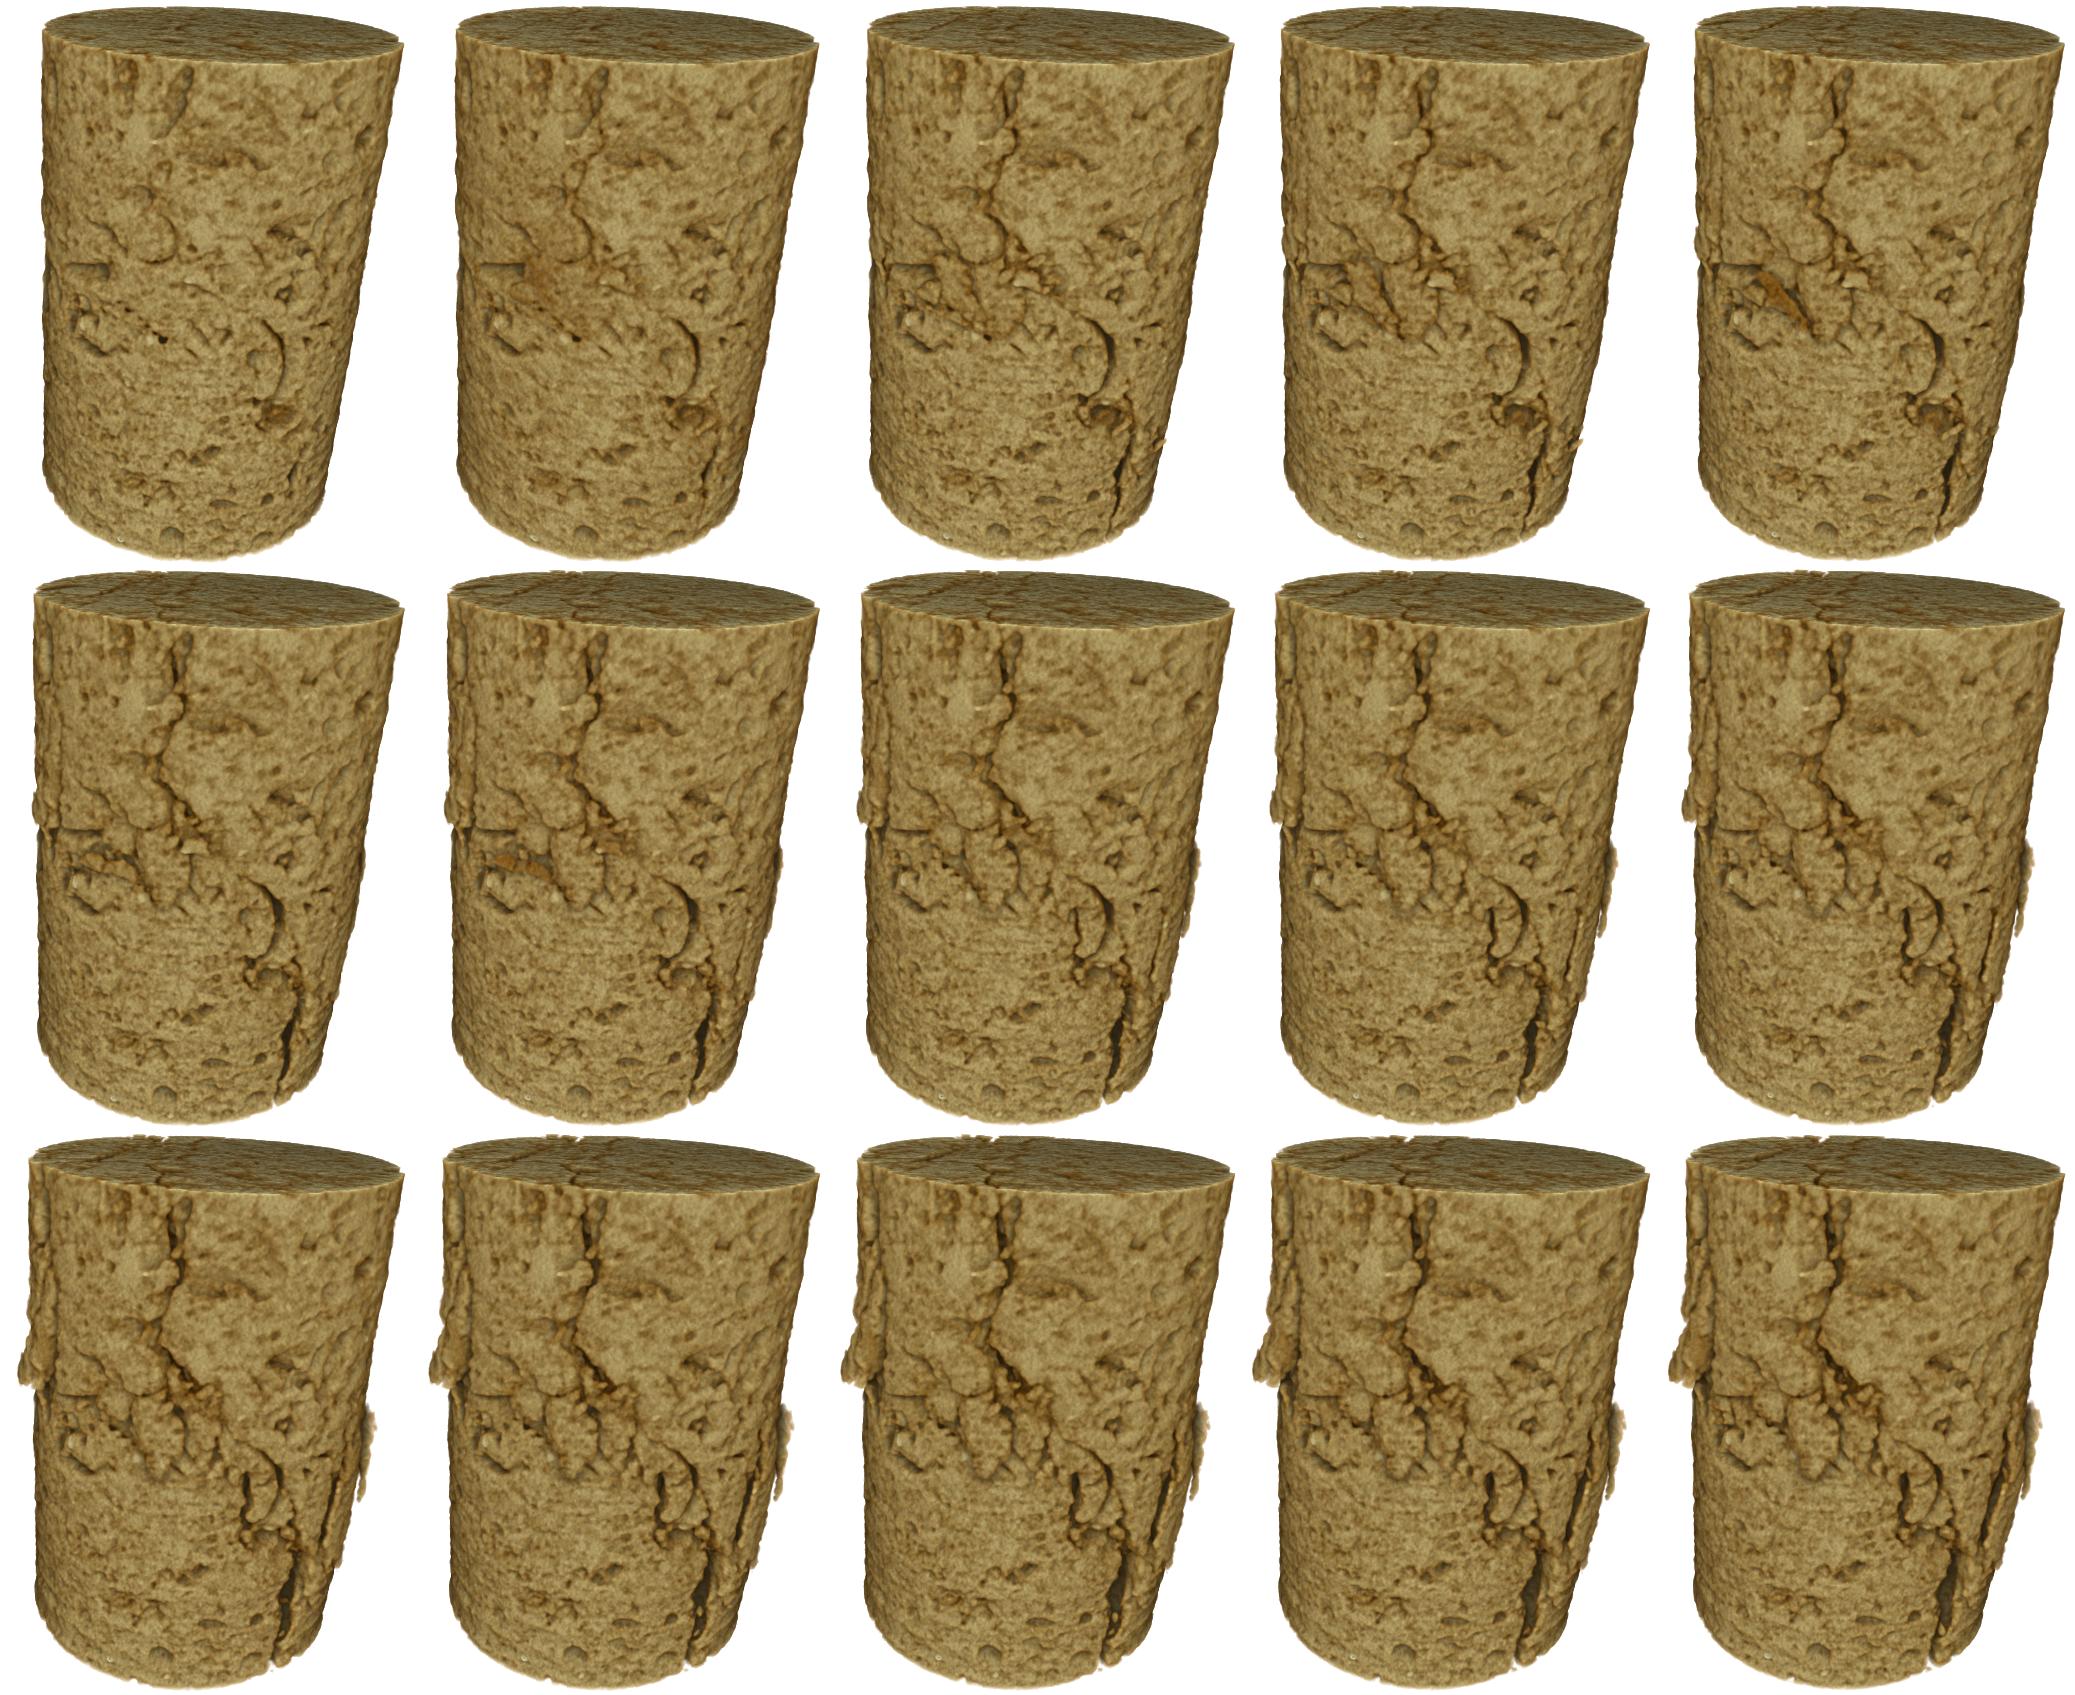 In situ dynamic compression series of limestone